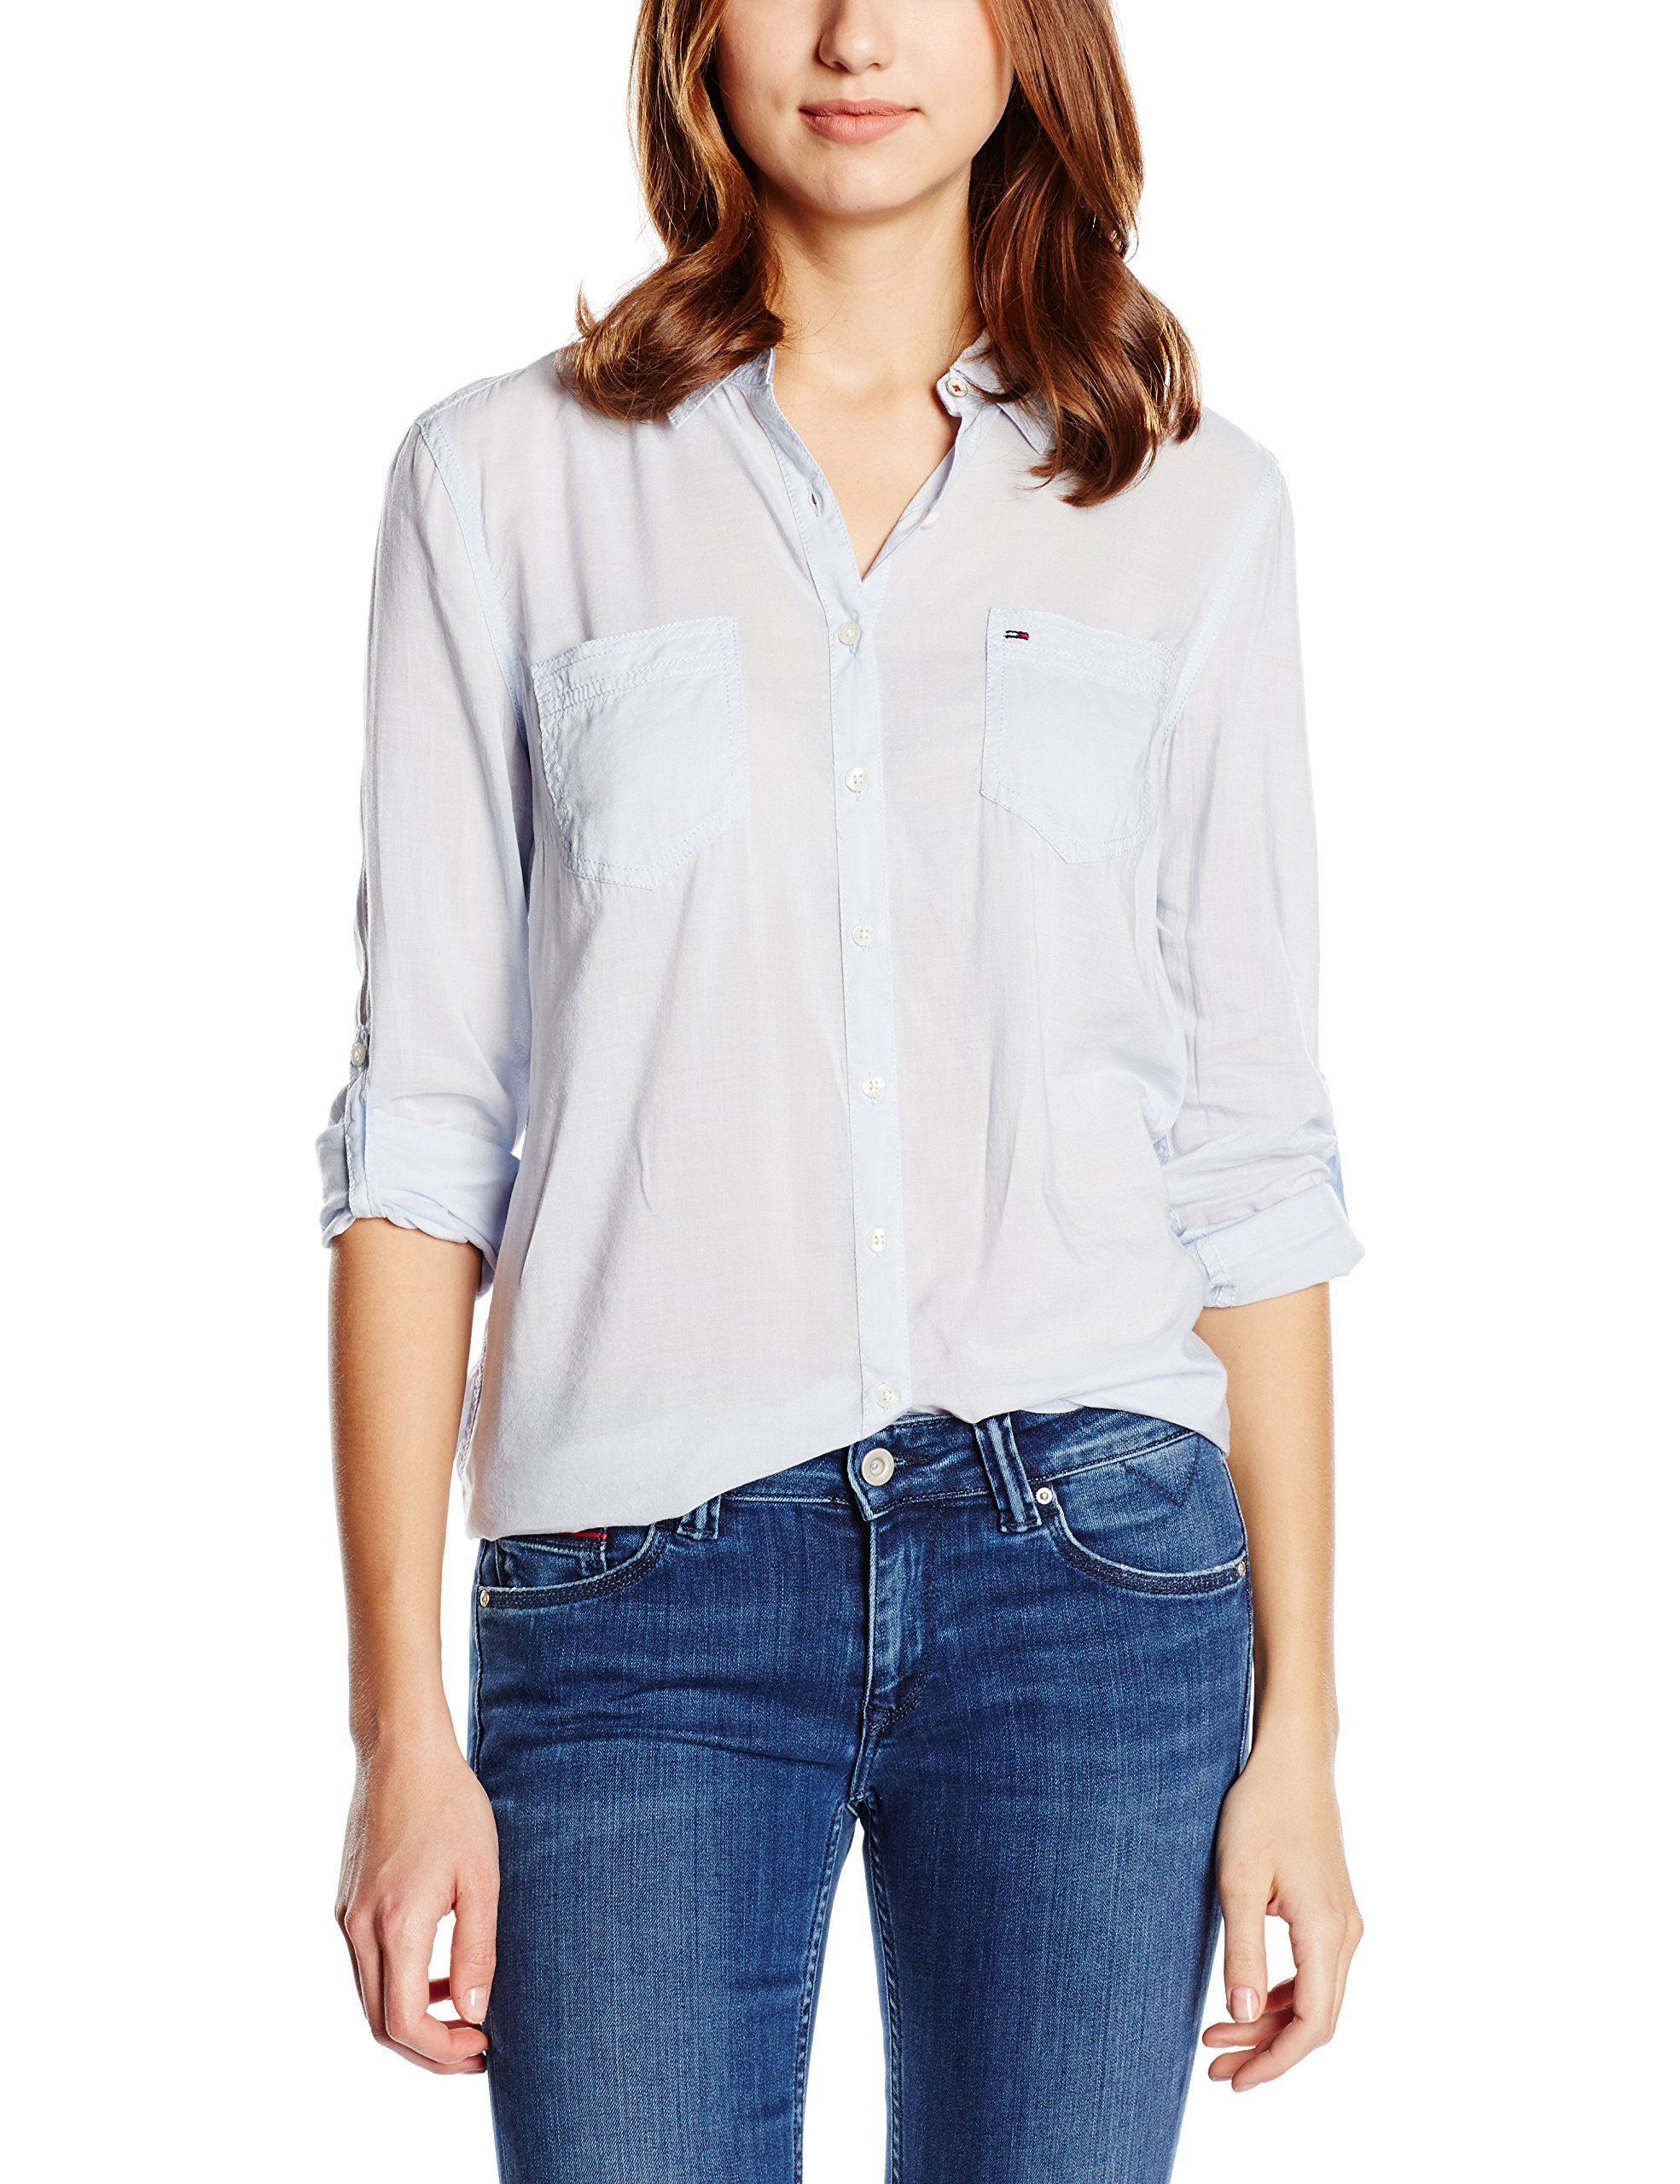 Tommy Hilfiger Original Lightweight Shirt L/S Camisa para Mujer